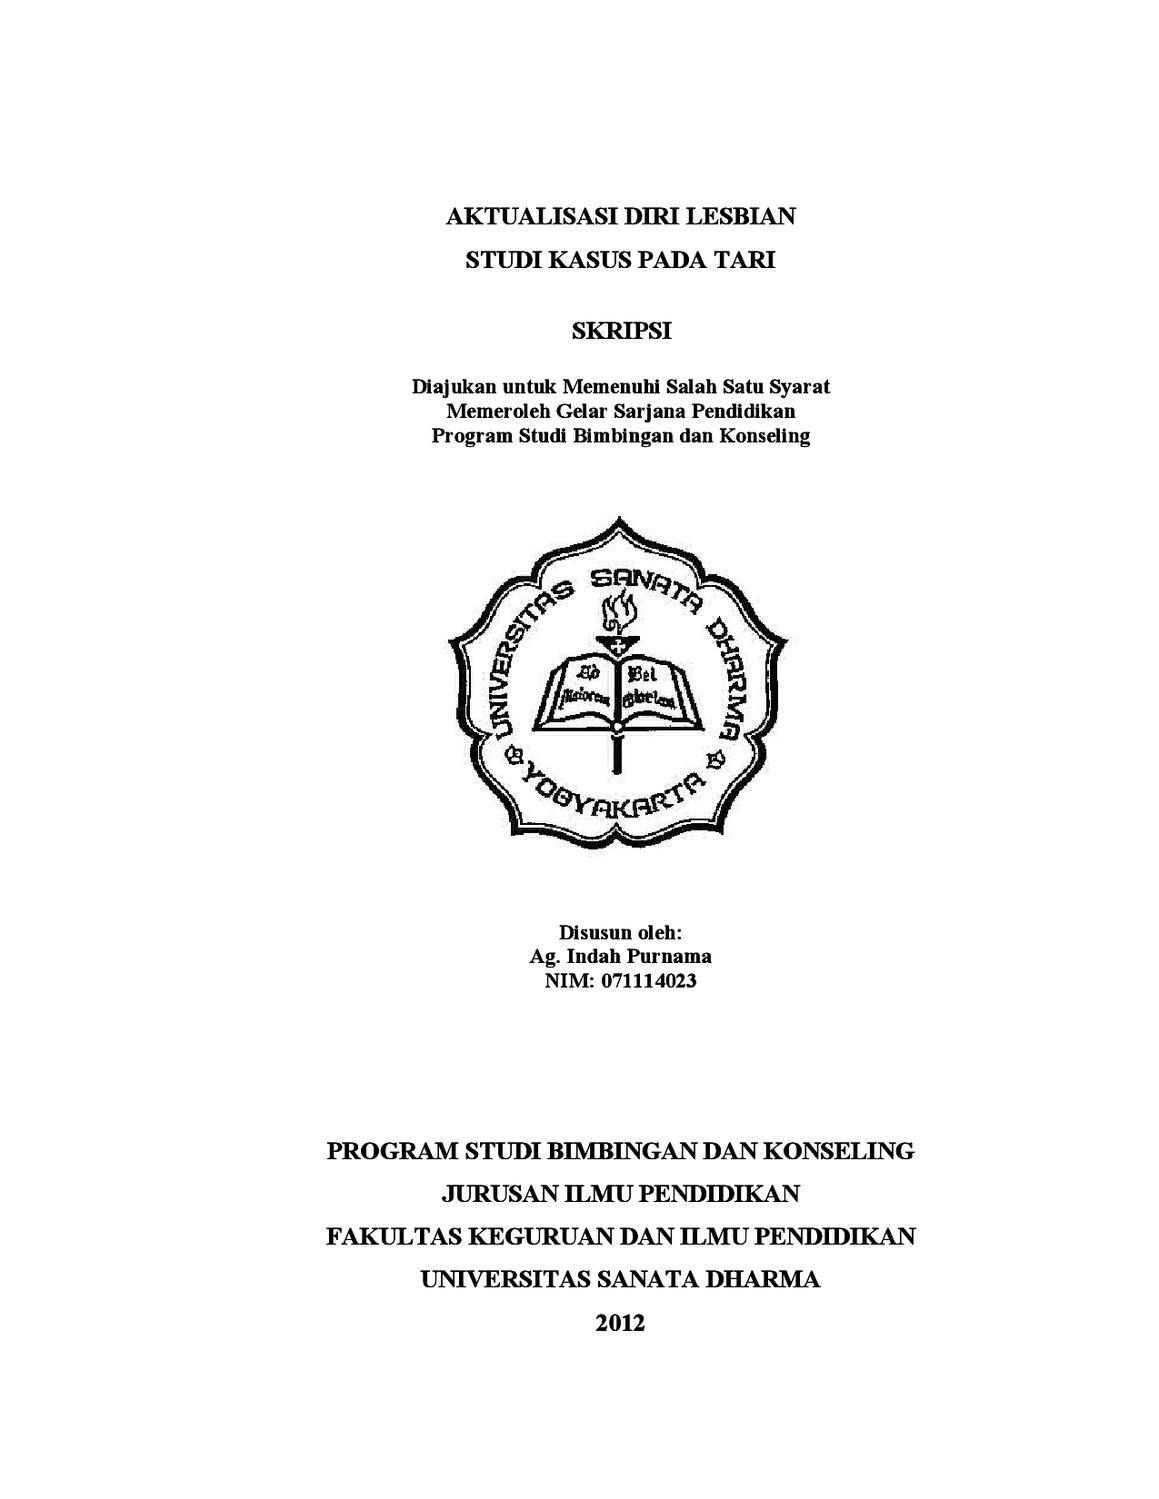 Aktualisasi Diri Lesbian Studi Kasus By Indah Purnama Issuu